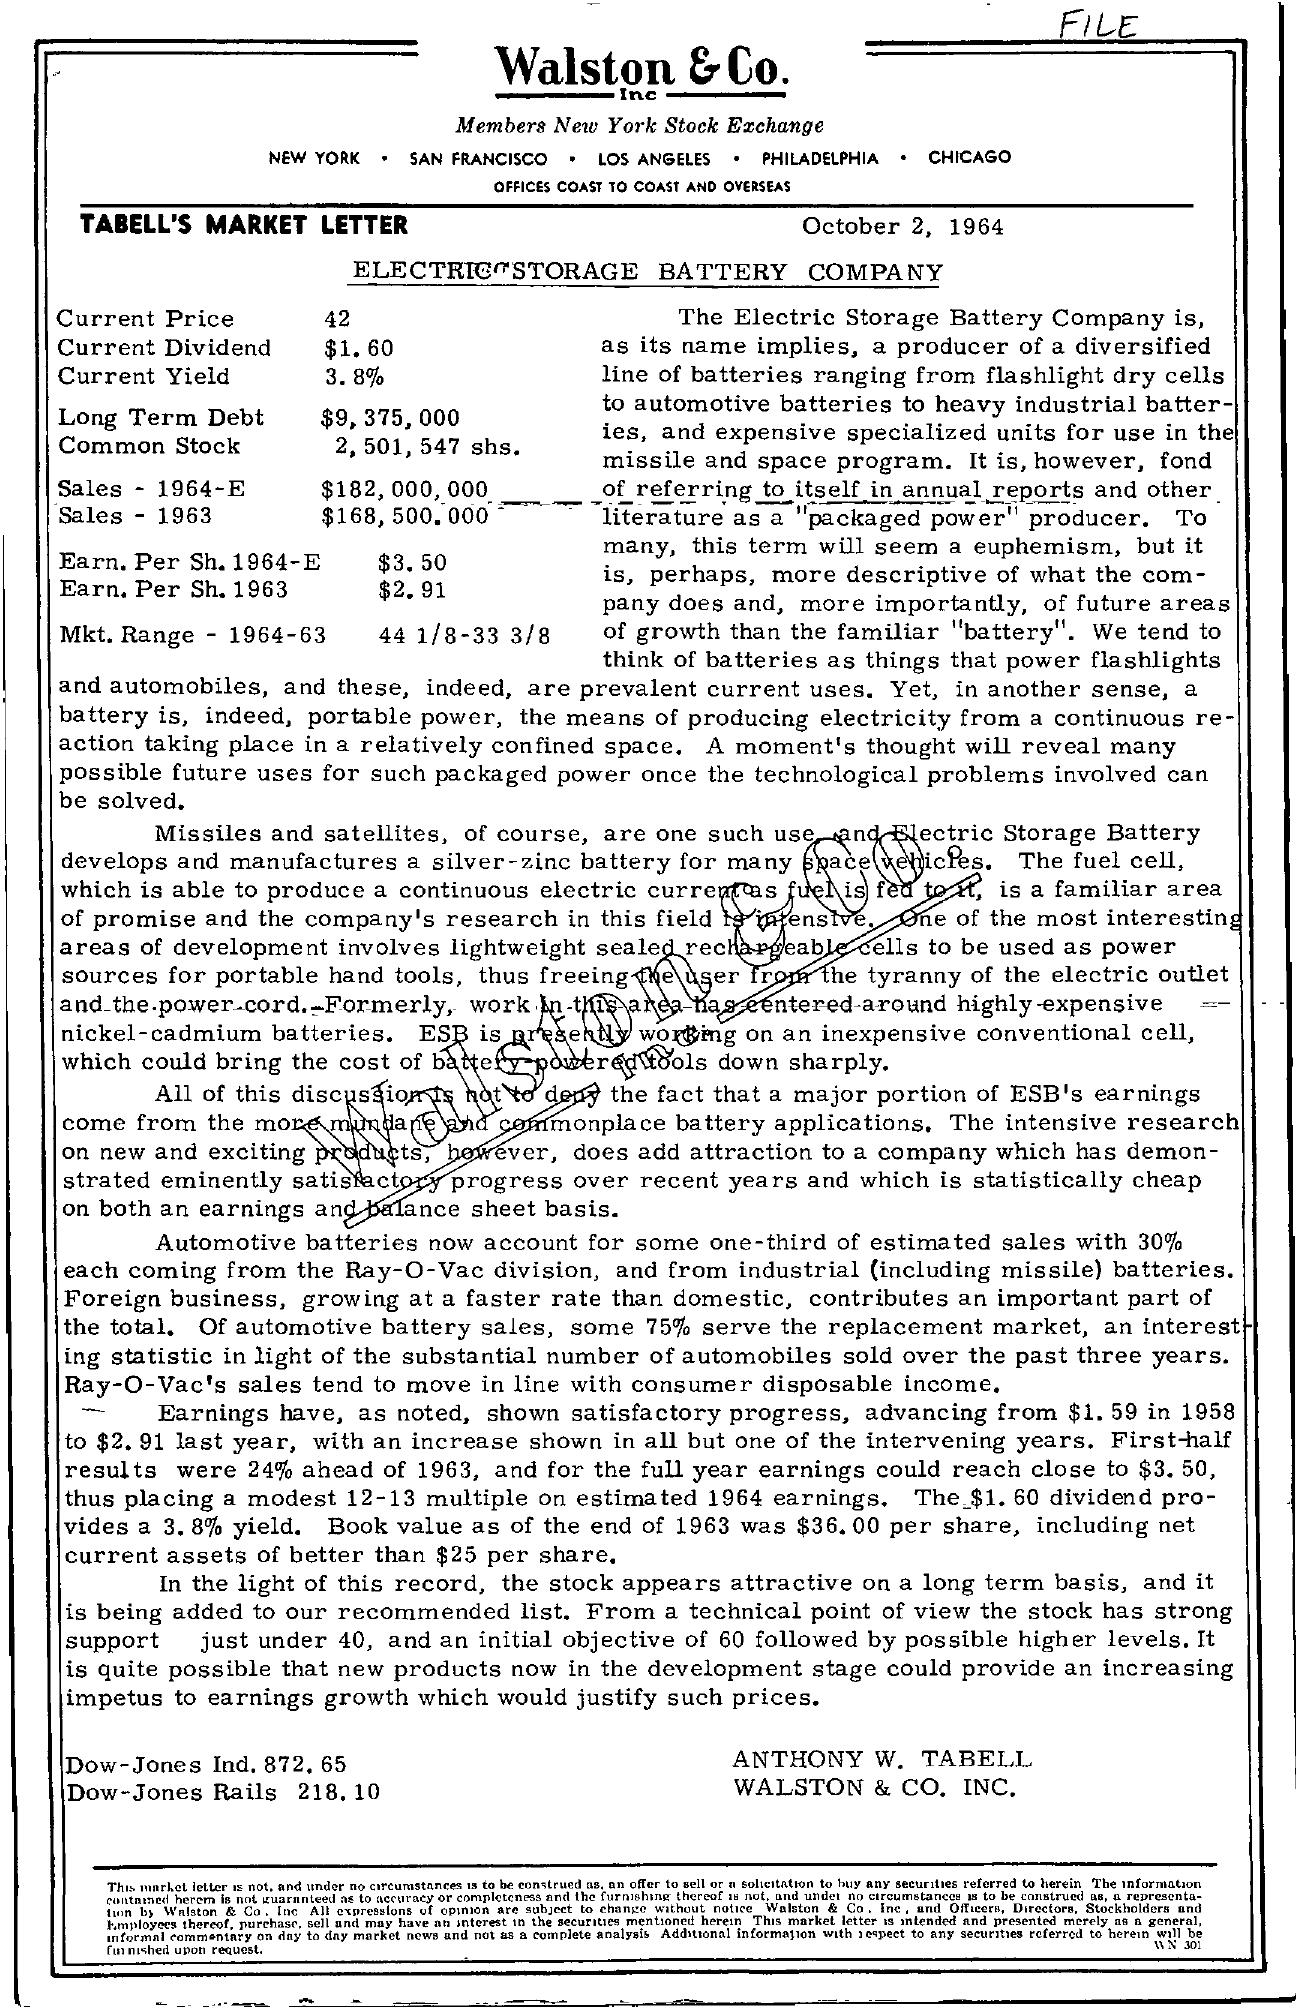 Tabell's Market Letter - October 02, 1964